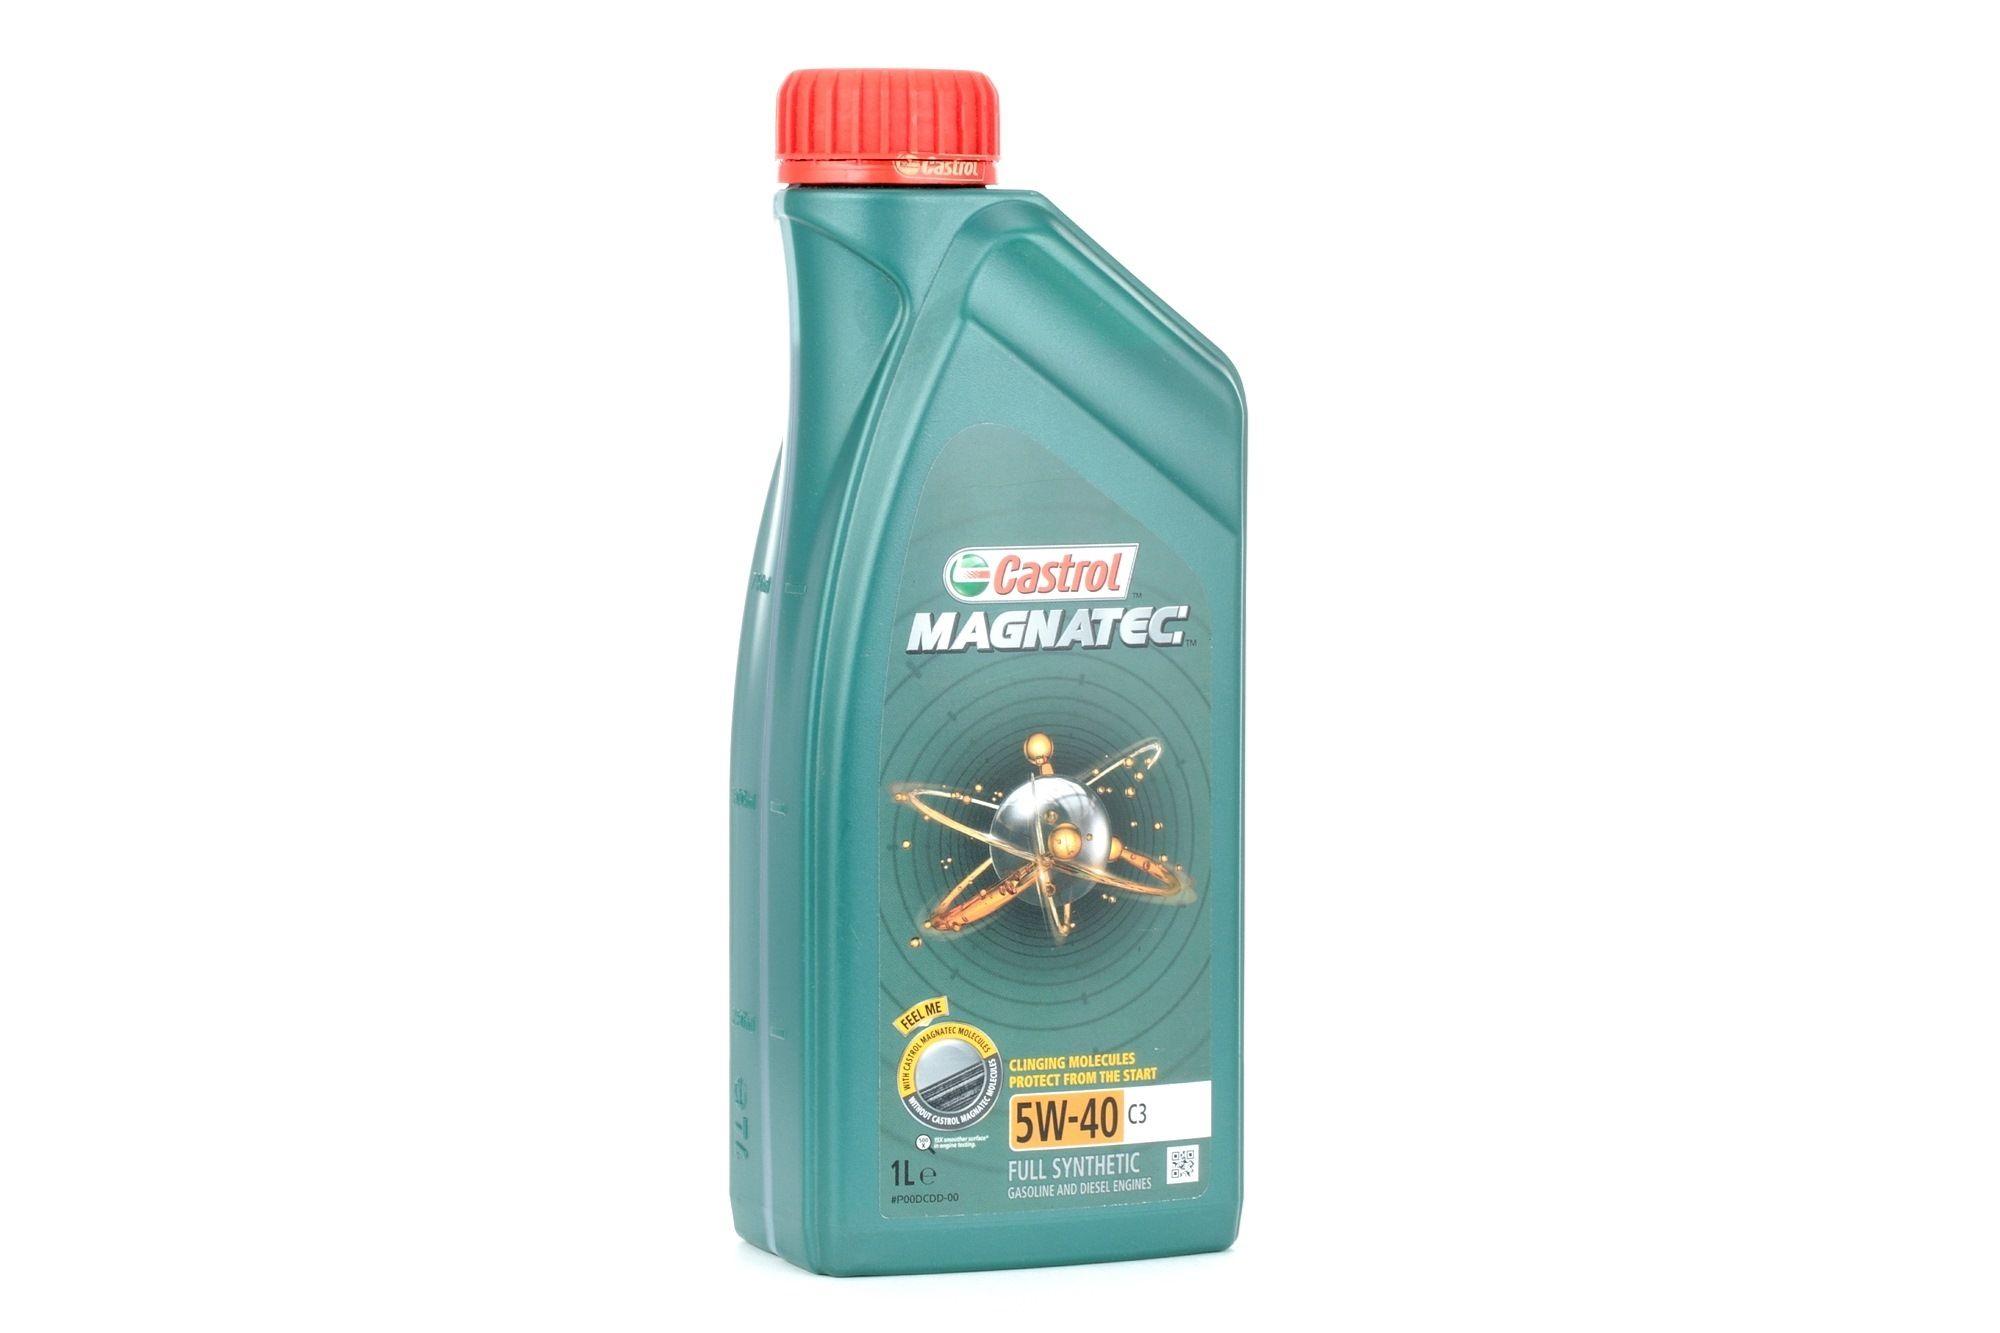 RenaultRN0710 CASTROL Magnatec, C3 5W-40, 1l, Synthetiköl Motoröl 151B37 günstig kaufen